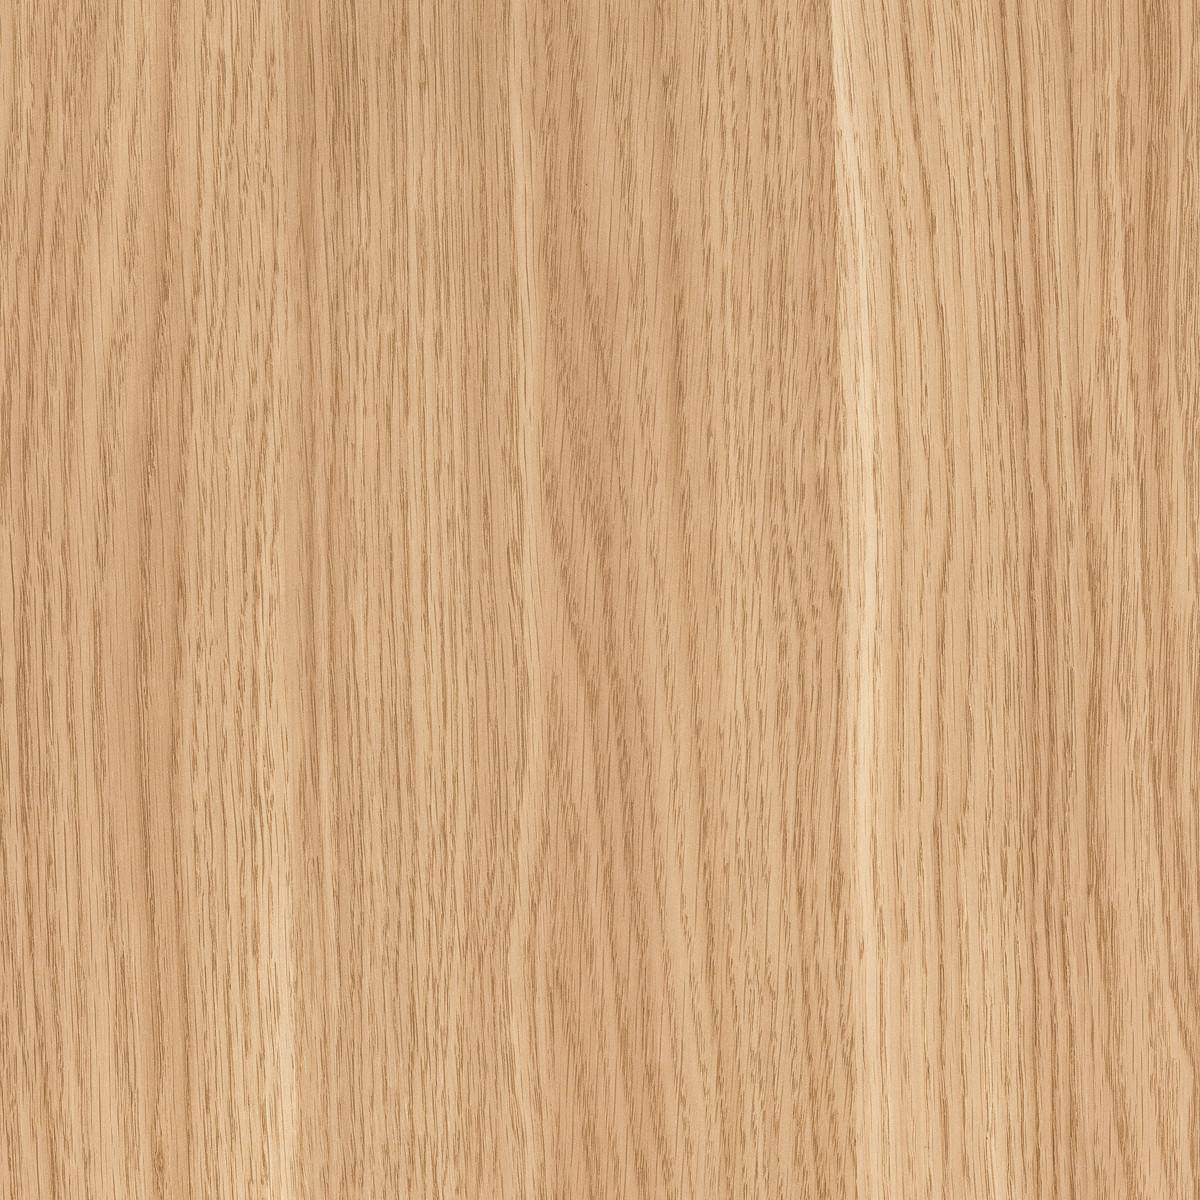 Resopal Schichtstoffplatten 4457 60, Yorkshire Oak Laminate Flooring